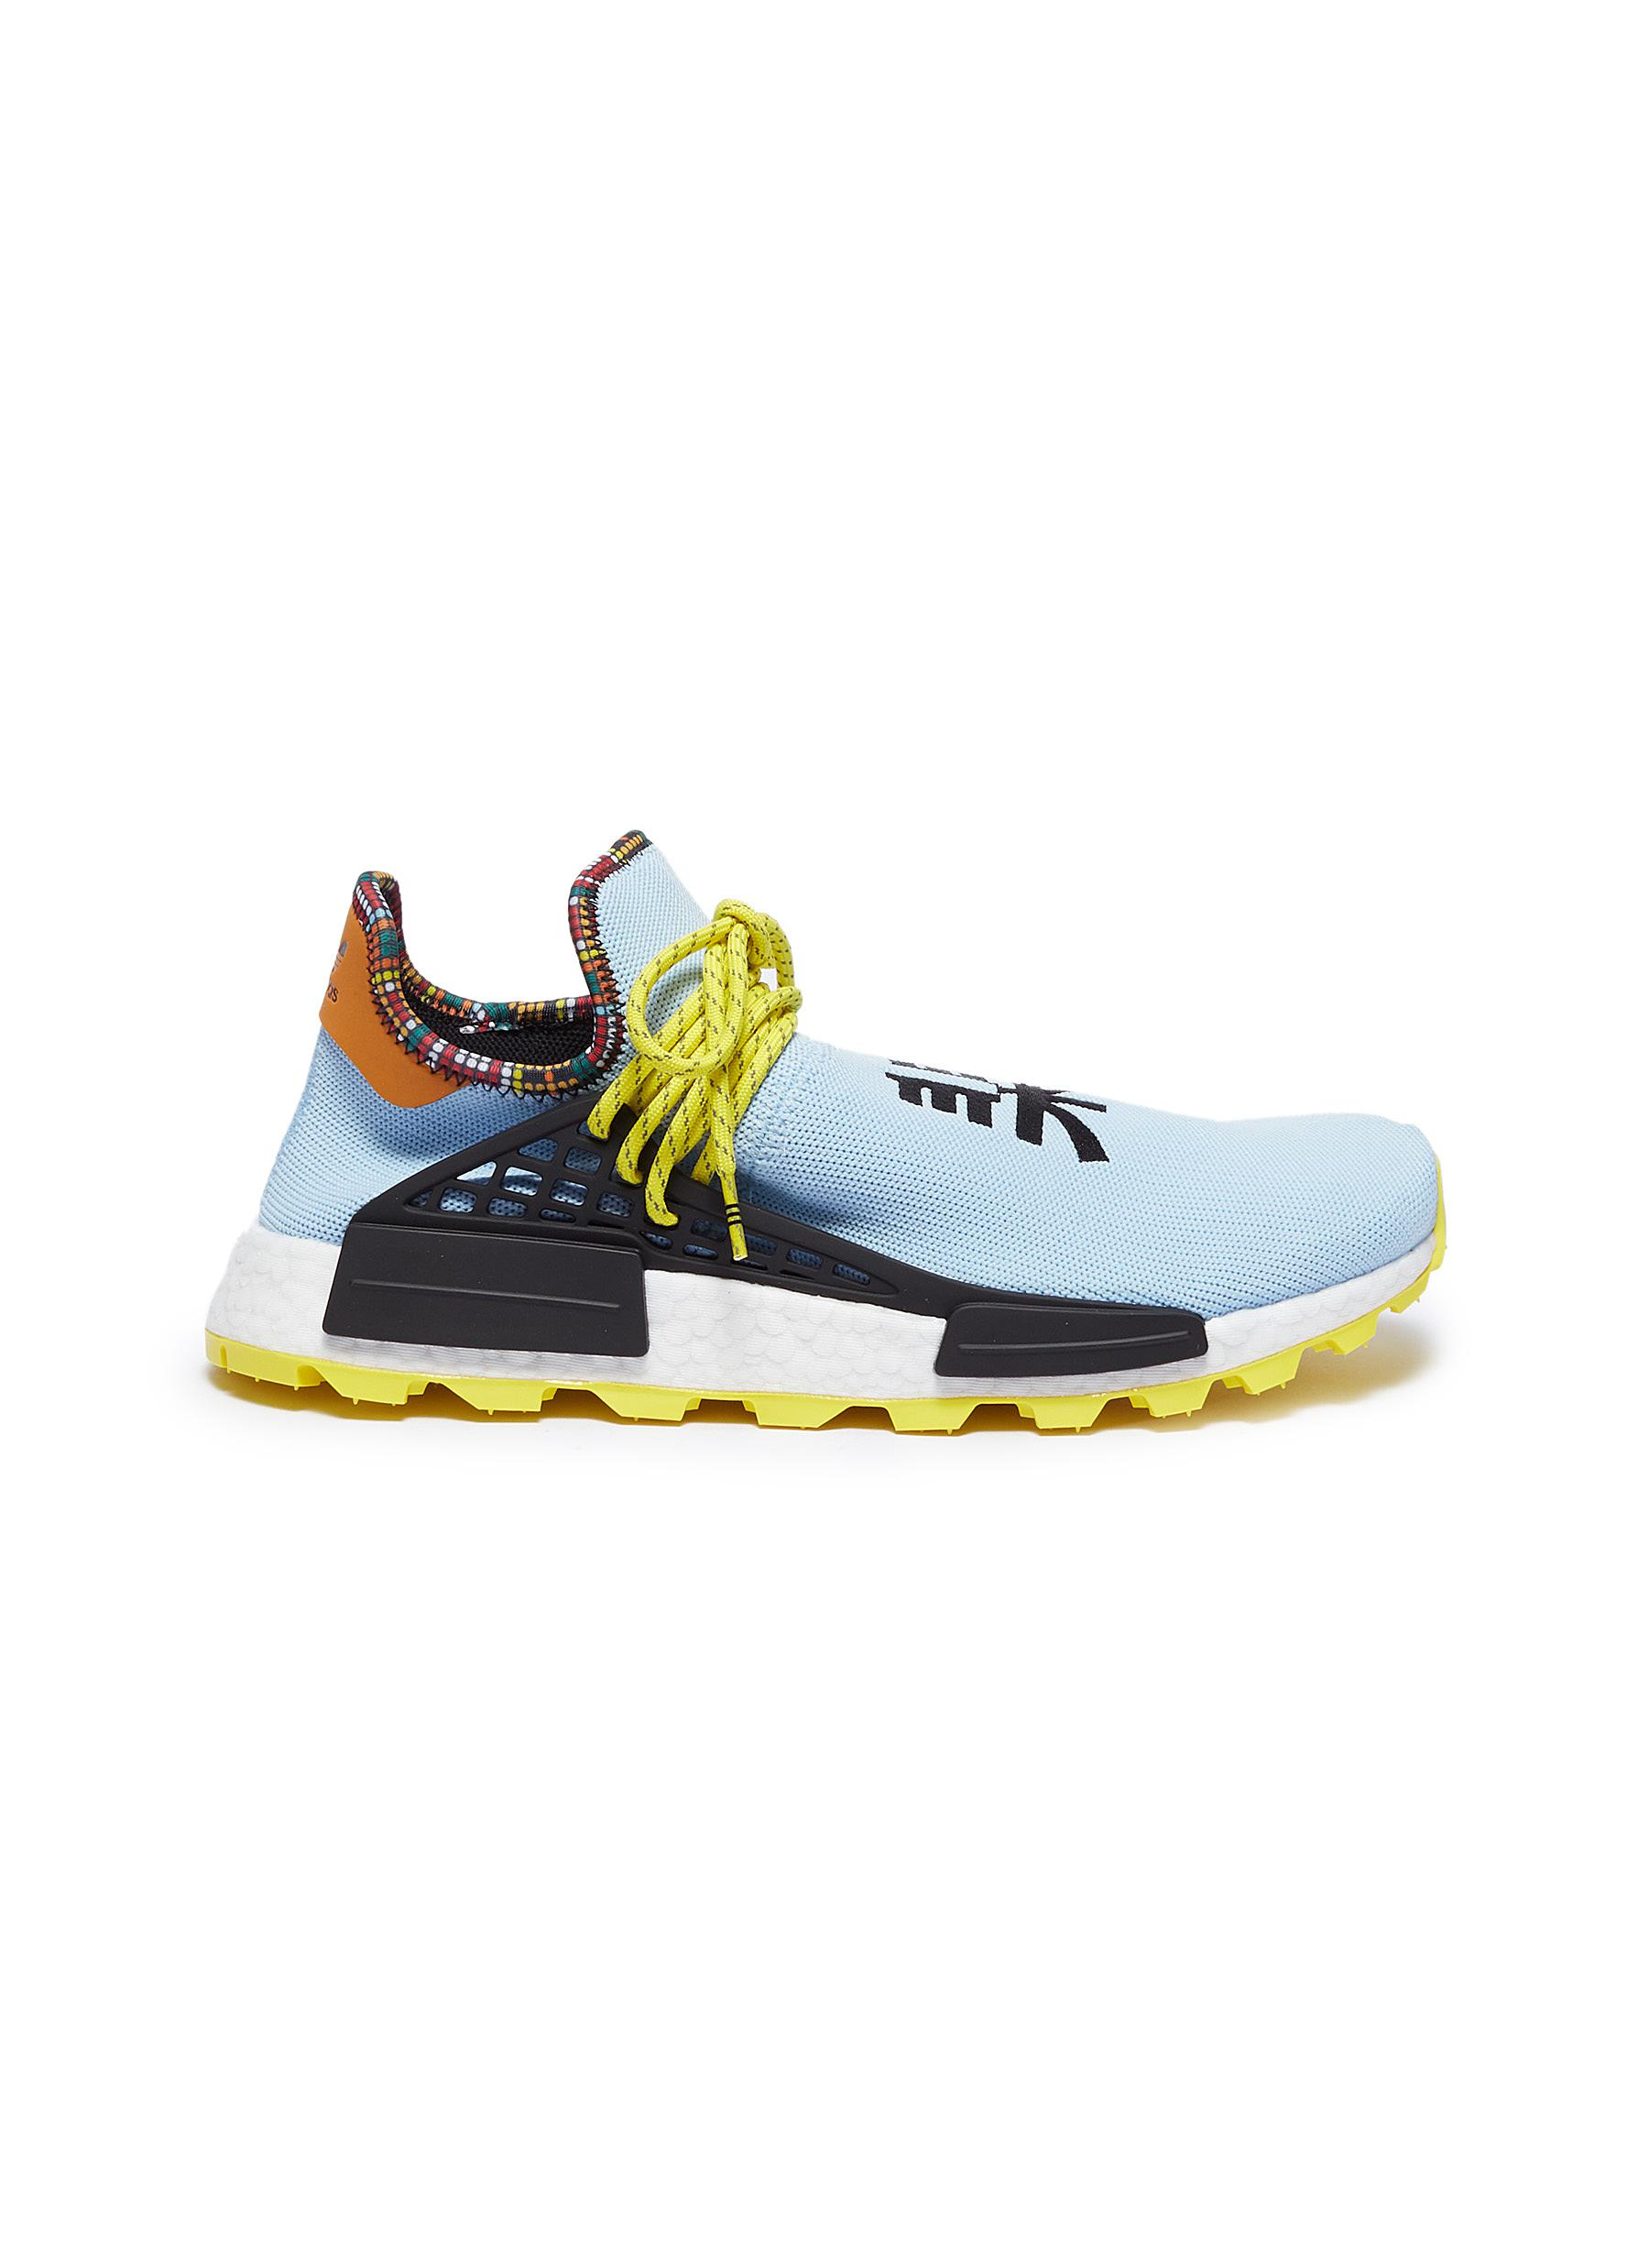 2c7fa798d adidas by Pharrell Williams.  SolarHu NMD  slogan embroidered Primeknit  sneakers